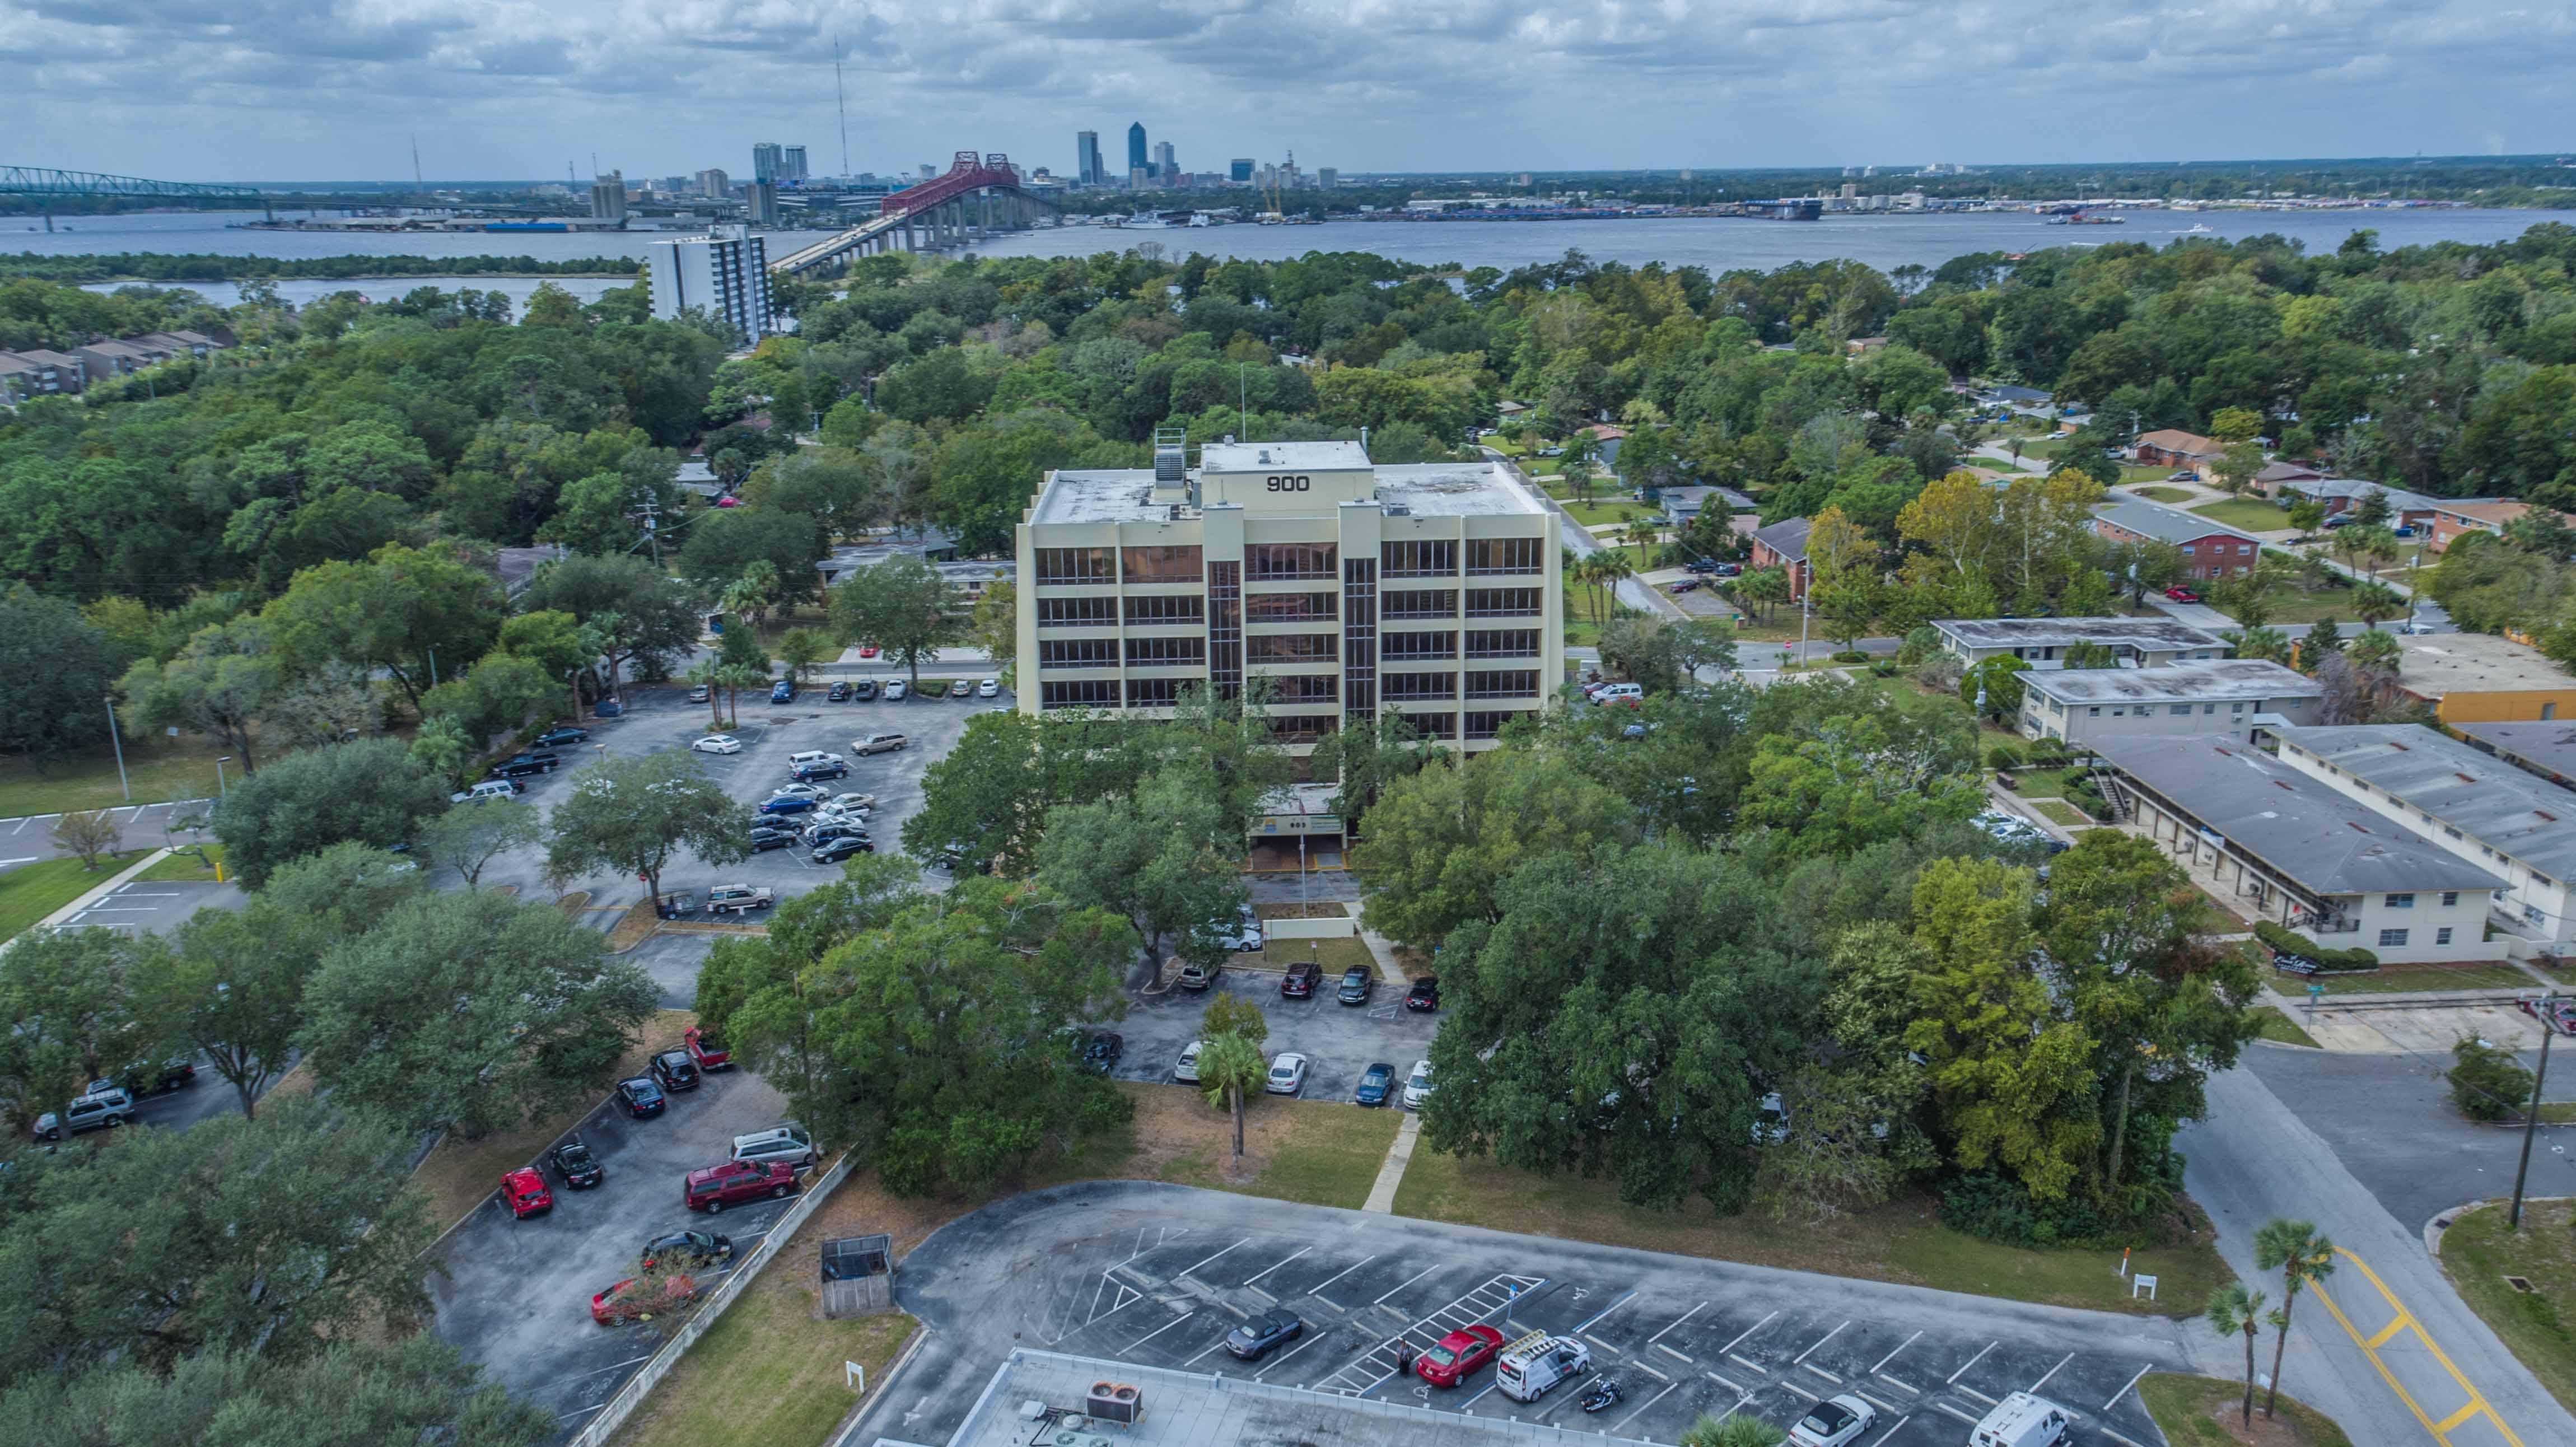 The 900 Building, 900 University Blvd N, Jax, FL 32211, 3,000 sf to 30,000 sf, office